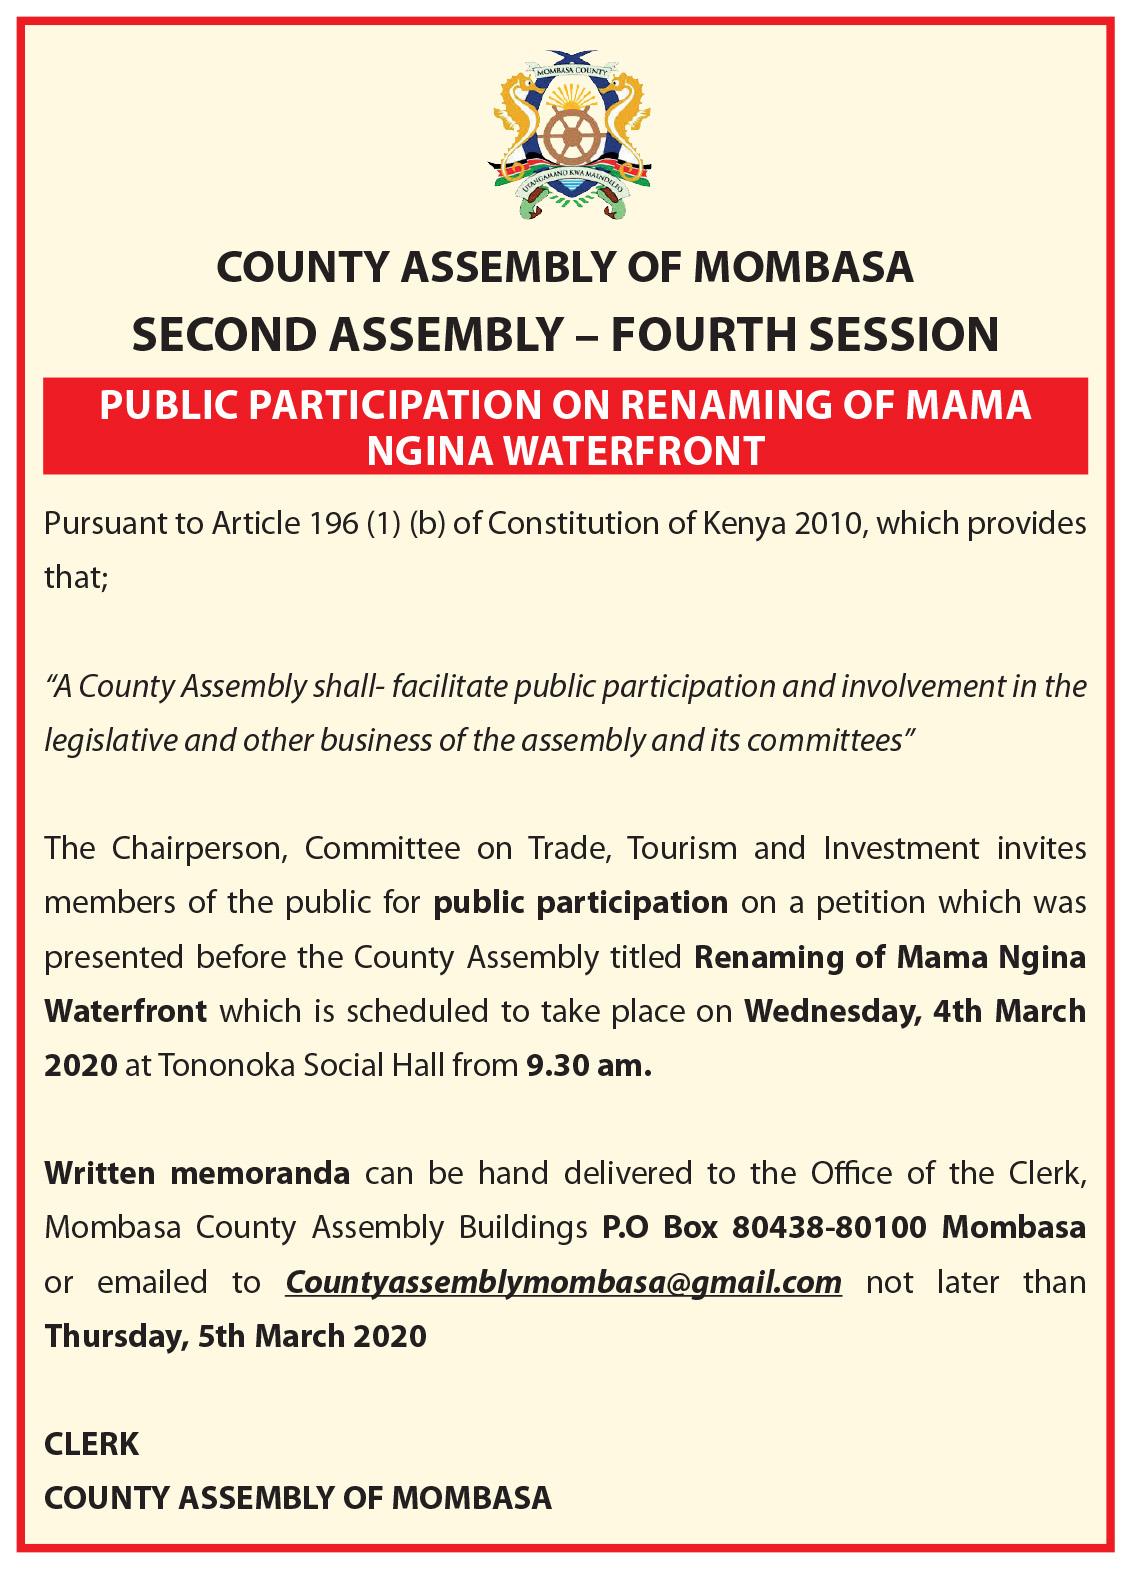 Mombasa County Assembly hearing on renaming Mombasa's waterfront park